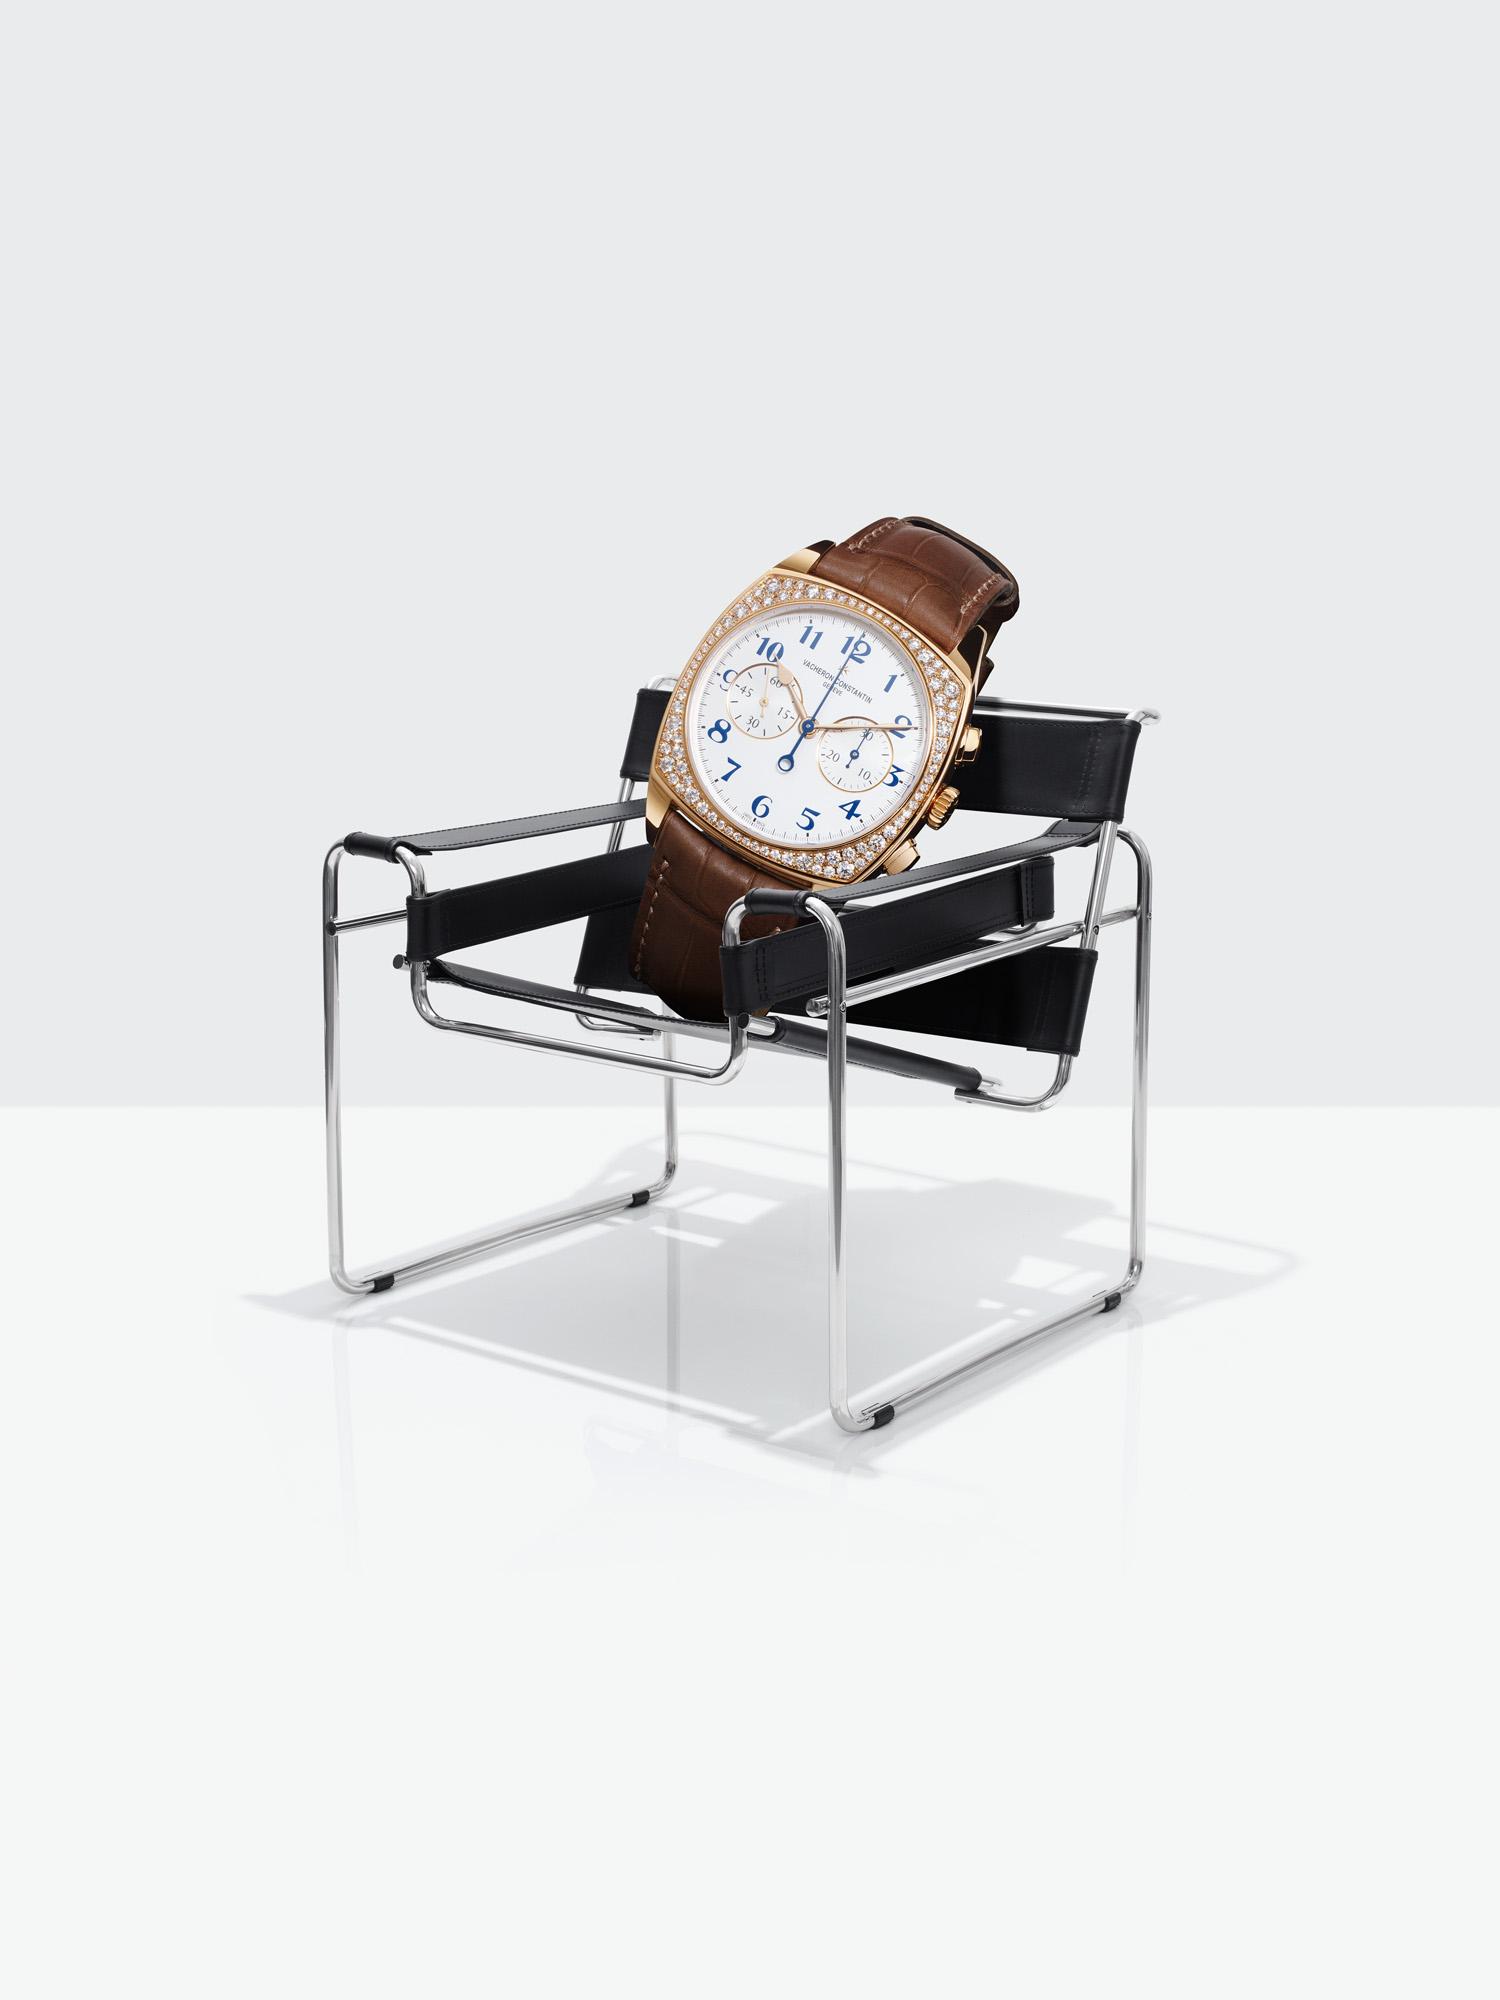 20150825 Wassily Chair-43475 inside hero v5 03a.jpg